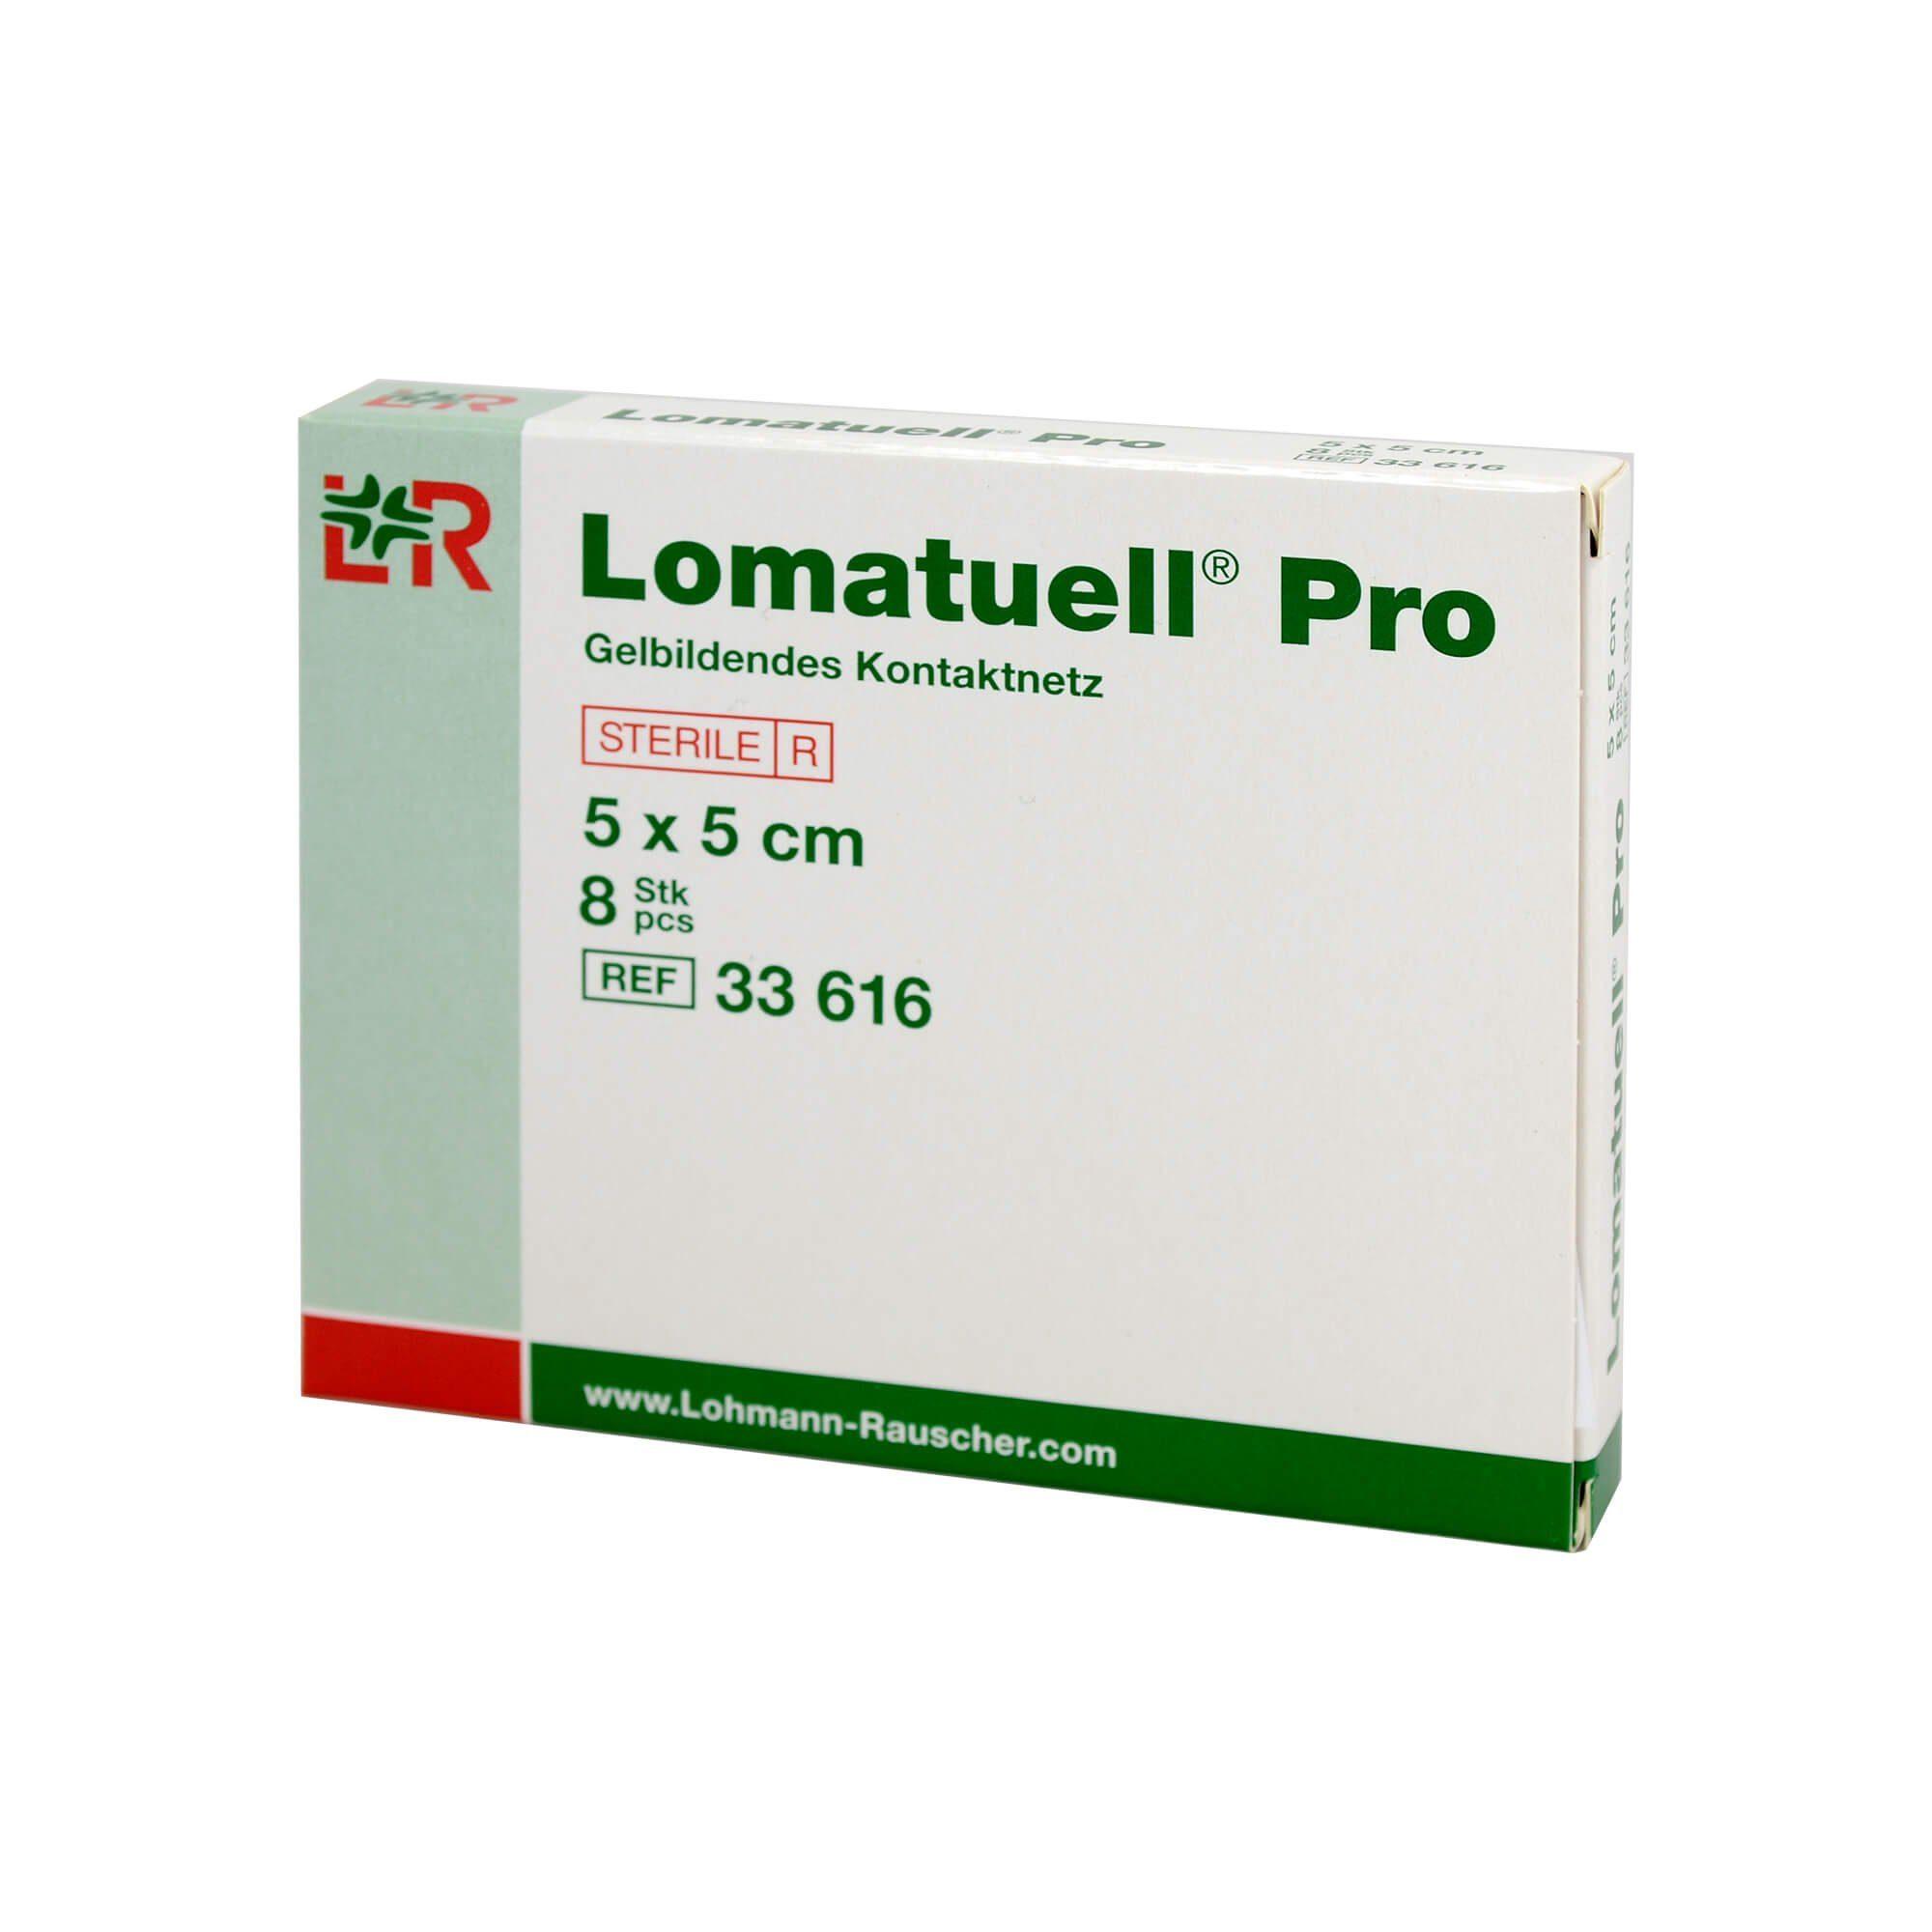 Lomatuell Pro Gelbildendes Kontaktnetz 5 cm x 5 cm, 8 St